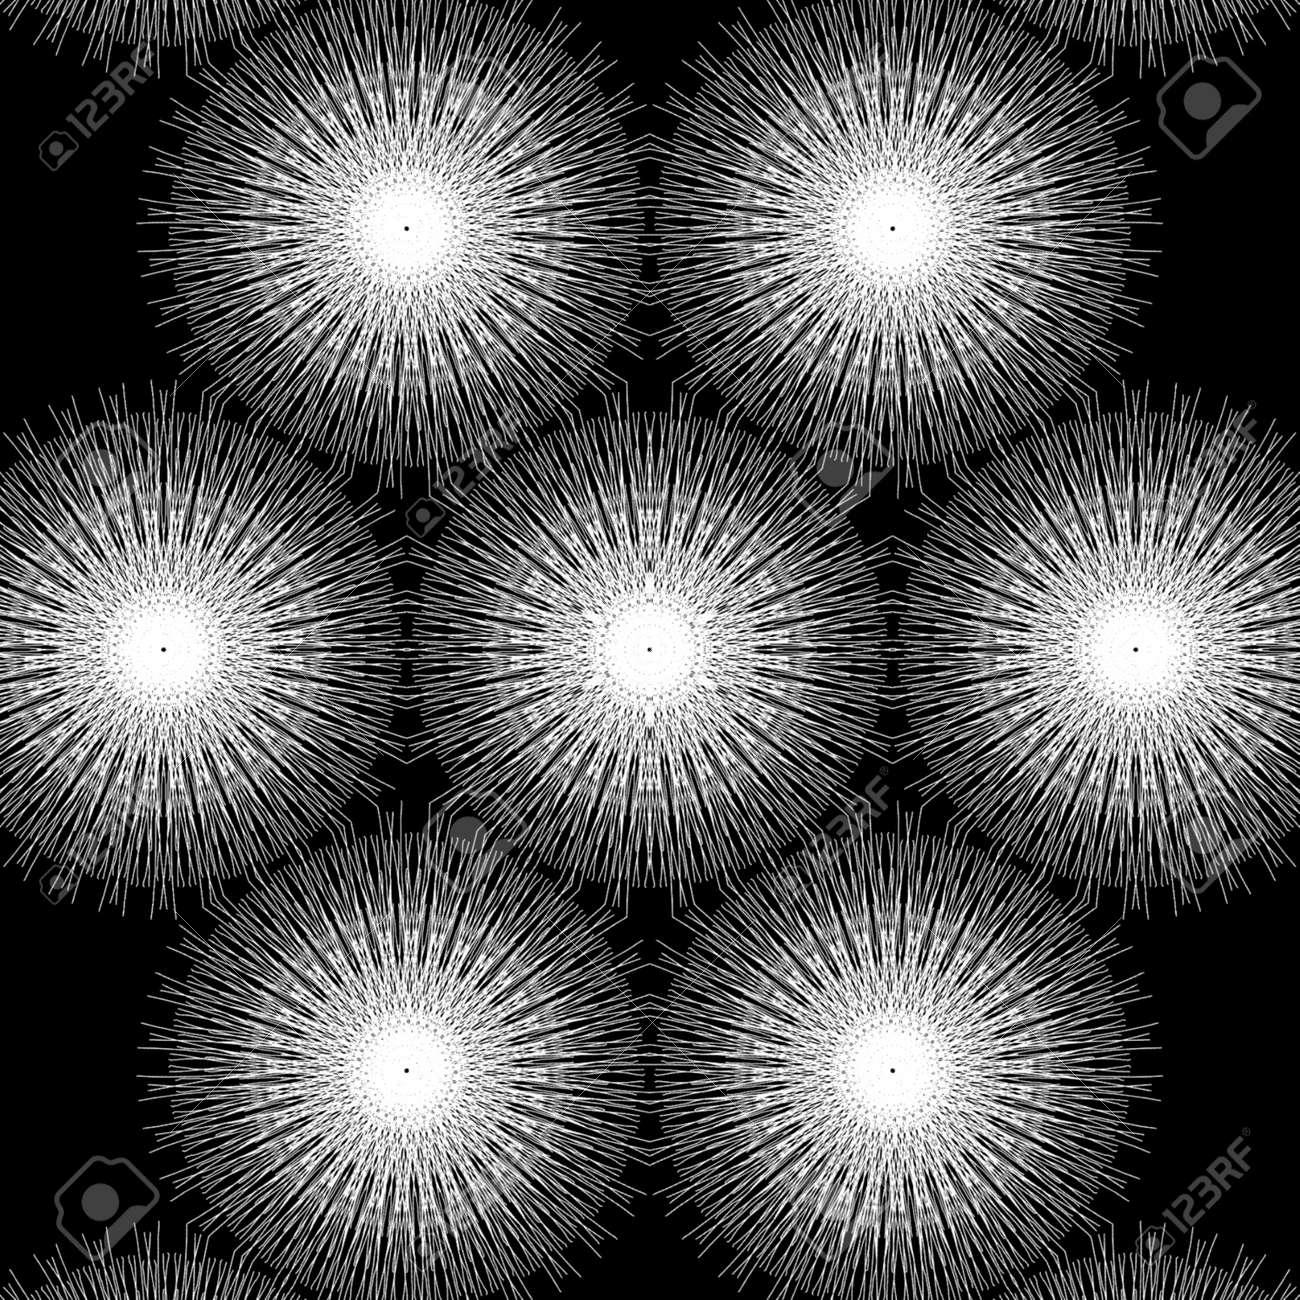 White pattern Design in black background - 155625915